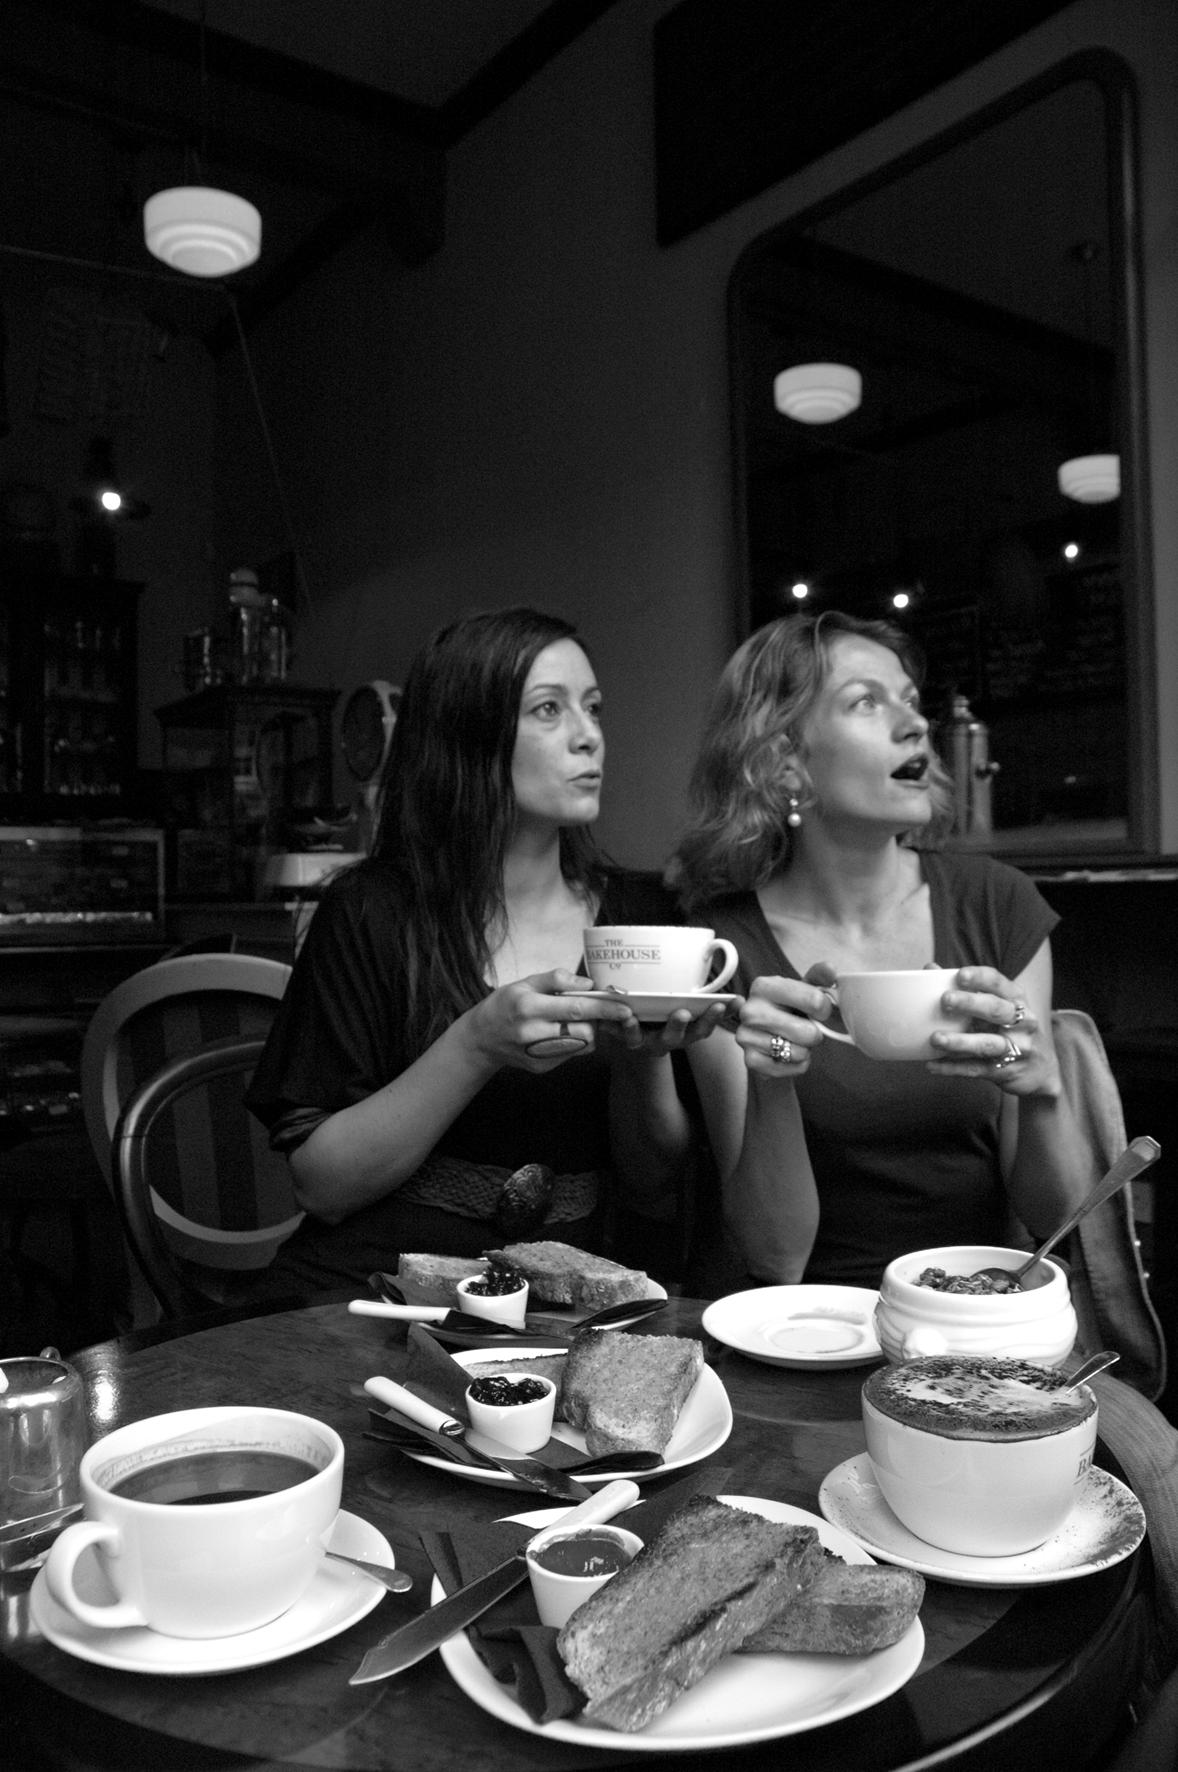 Sandrine, Magali, Edimbourg